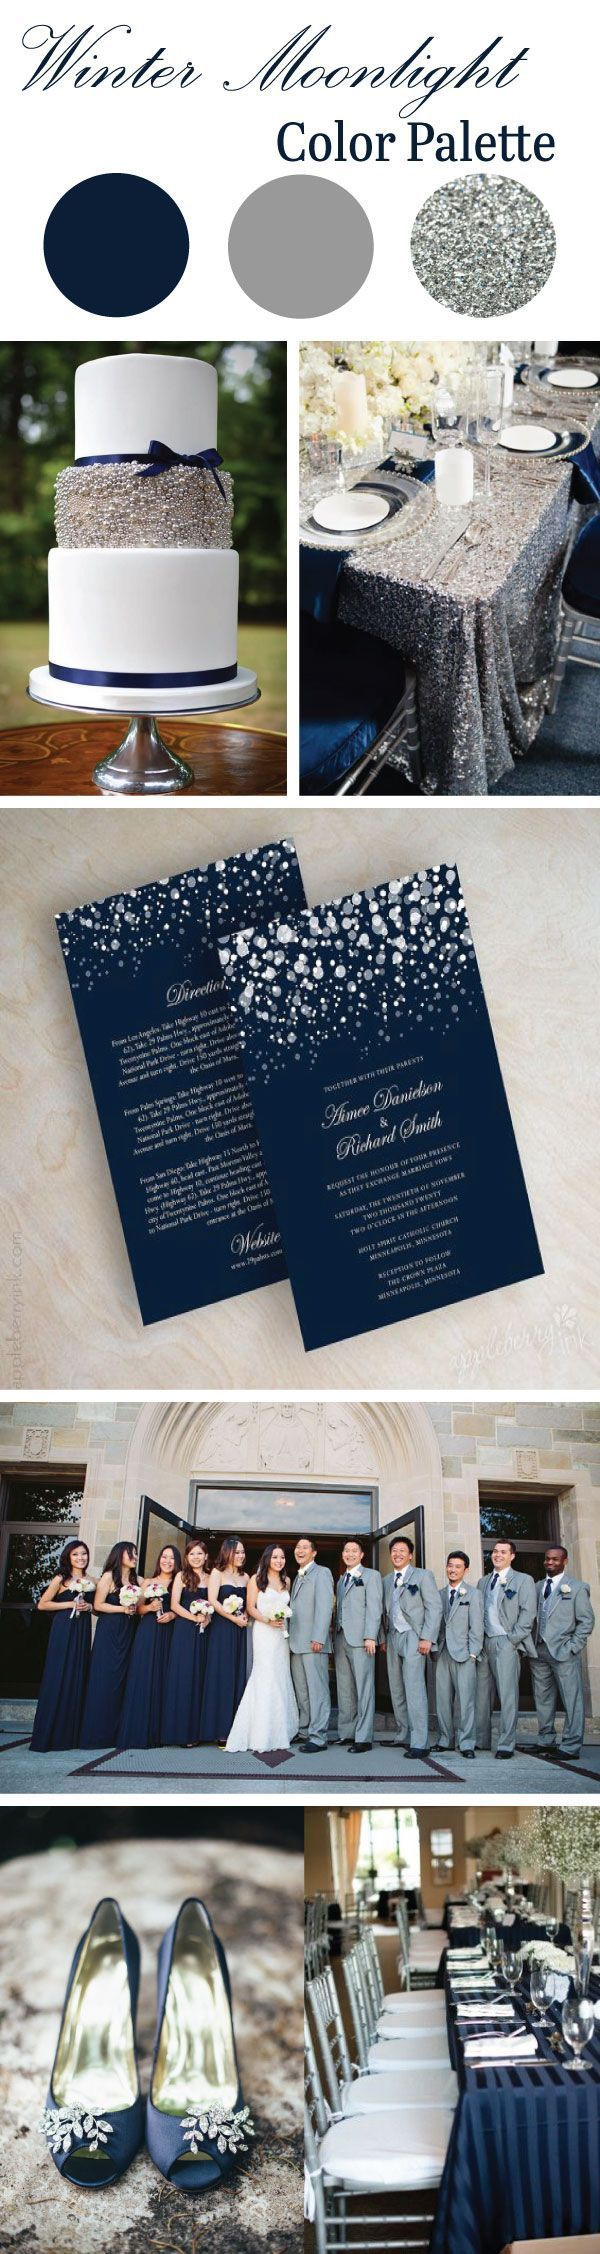 Winter Moonlight Wedding Color Palette | LinenTablecloth Blog #colorpalette # wedding #events